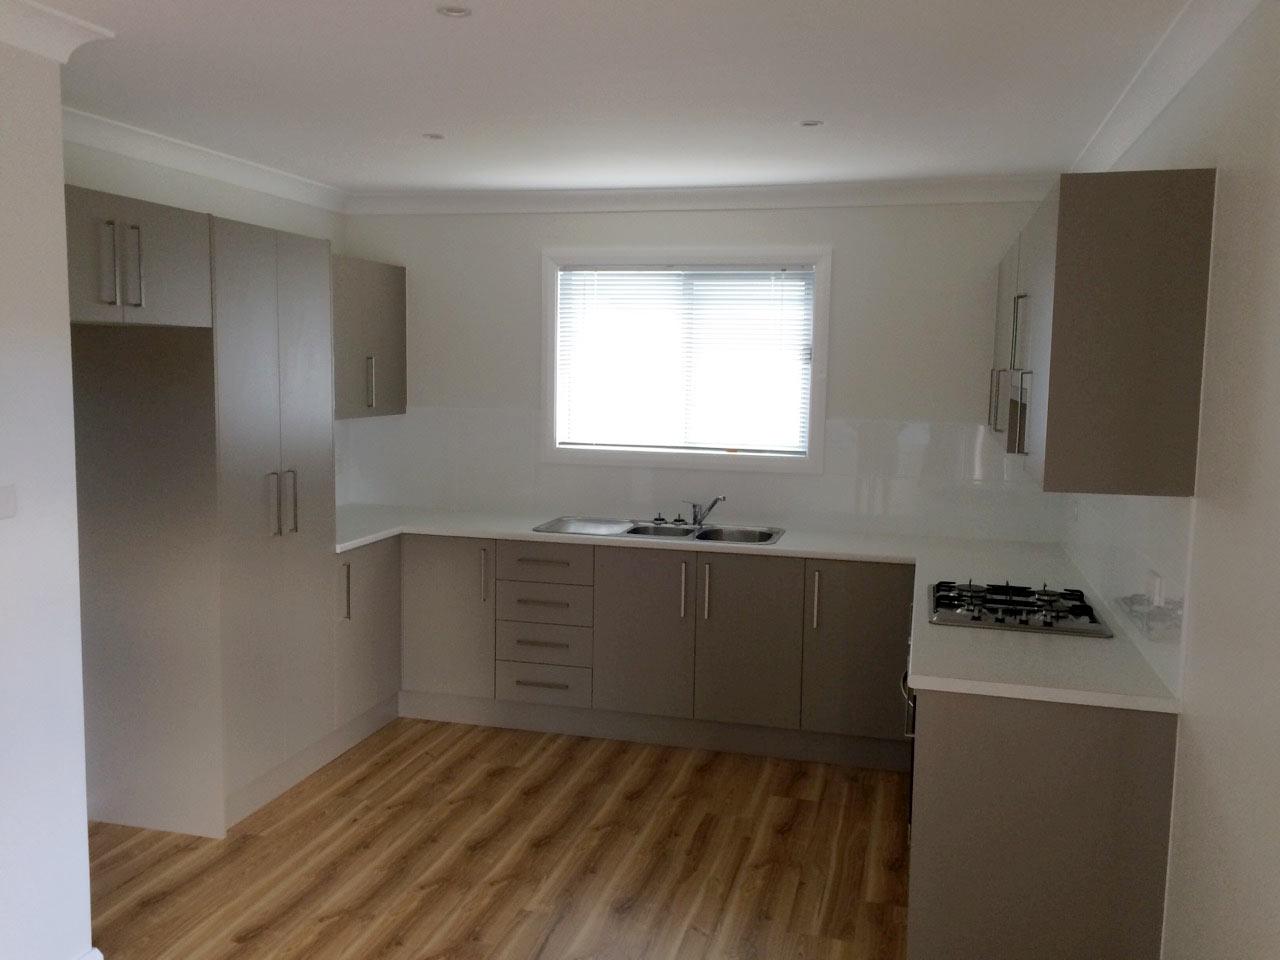 lt drafting newcastle granny flat ross street belmont kitchen